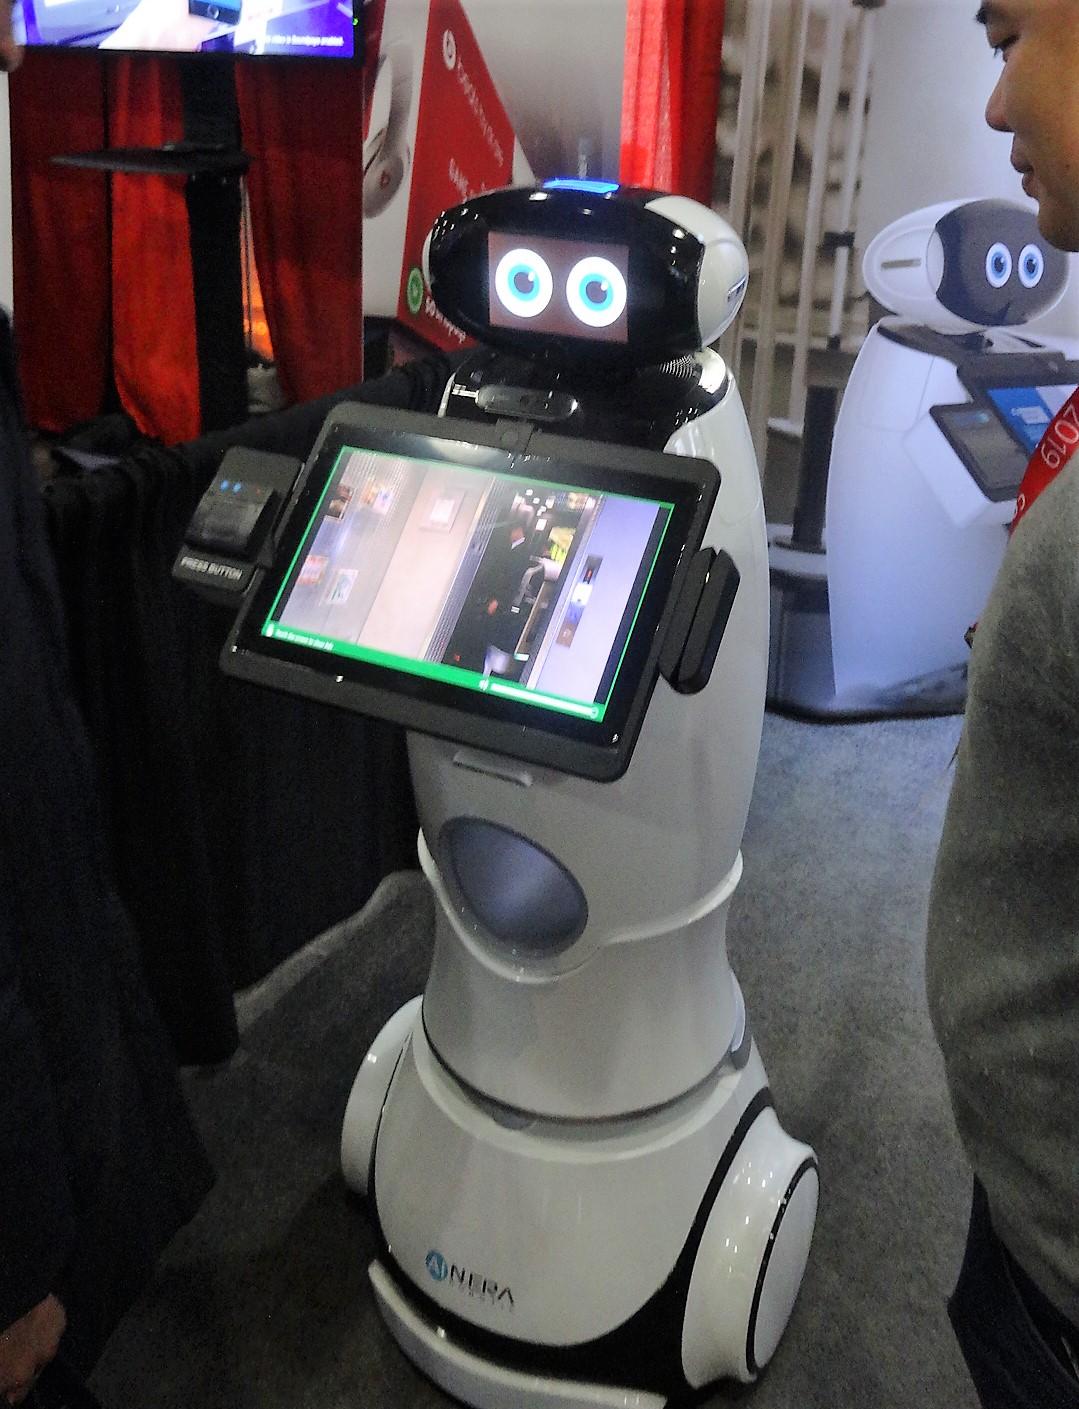 Interactive kiosk innovations let loose at NRF Big Show   2019 NRF